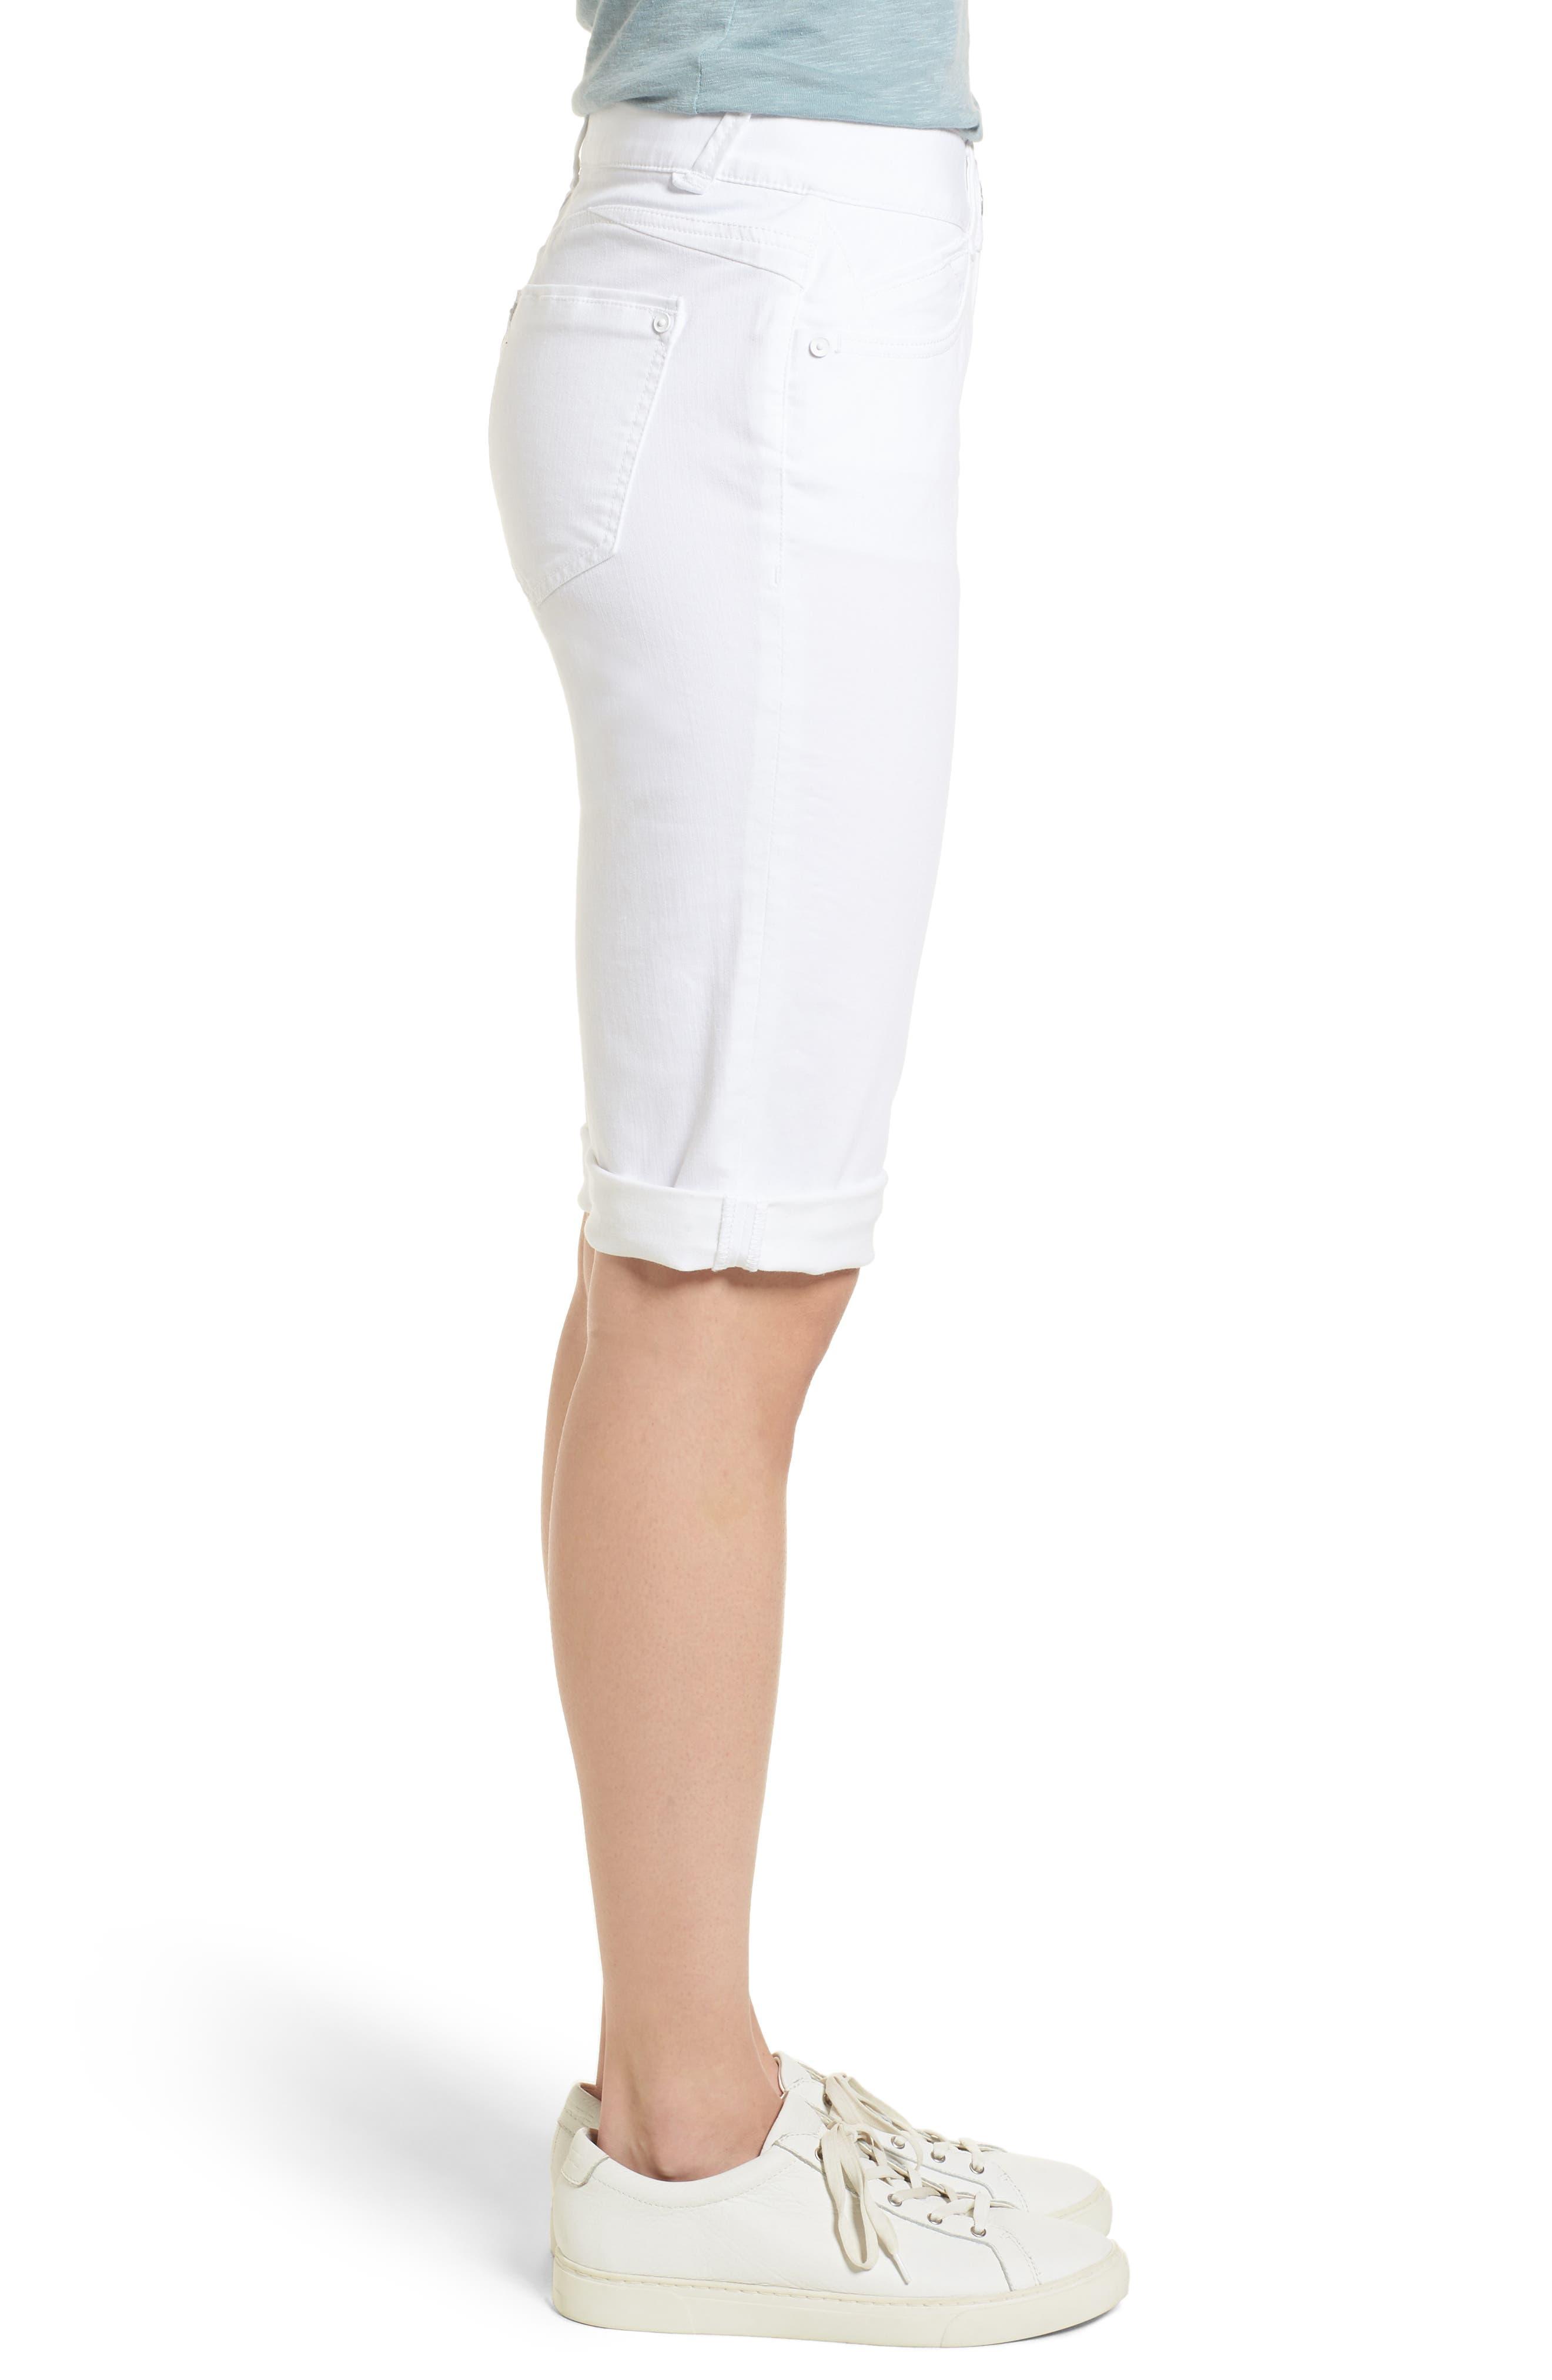 WIT & WISDOM, Ab-solution White Bermuda Shorts, Alternate thumbnail 4, color, OPTIC WHITE